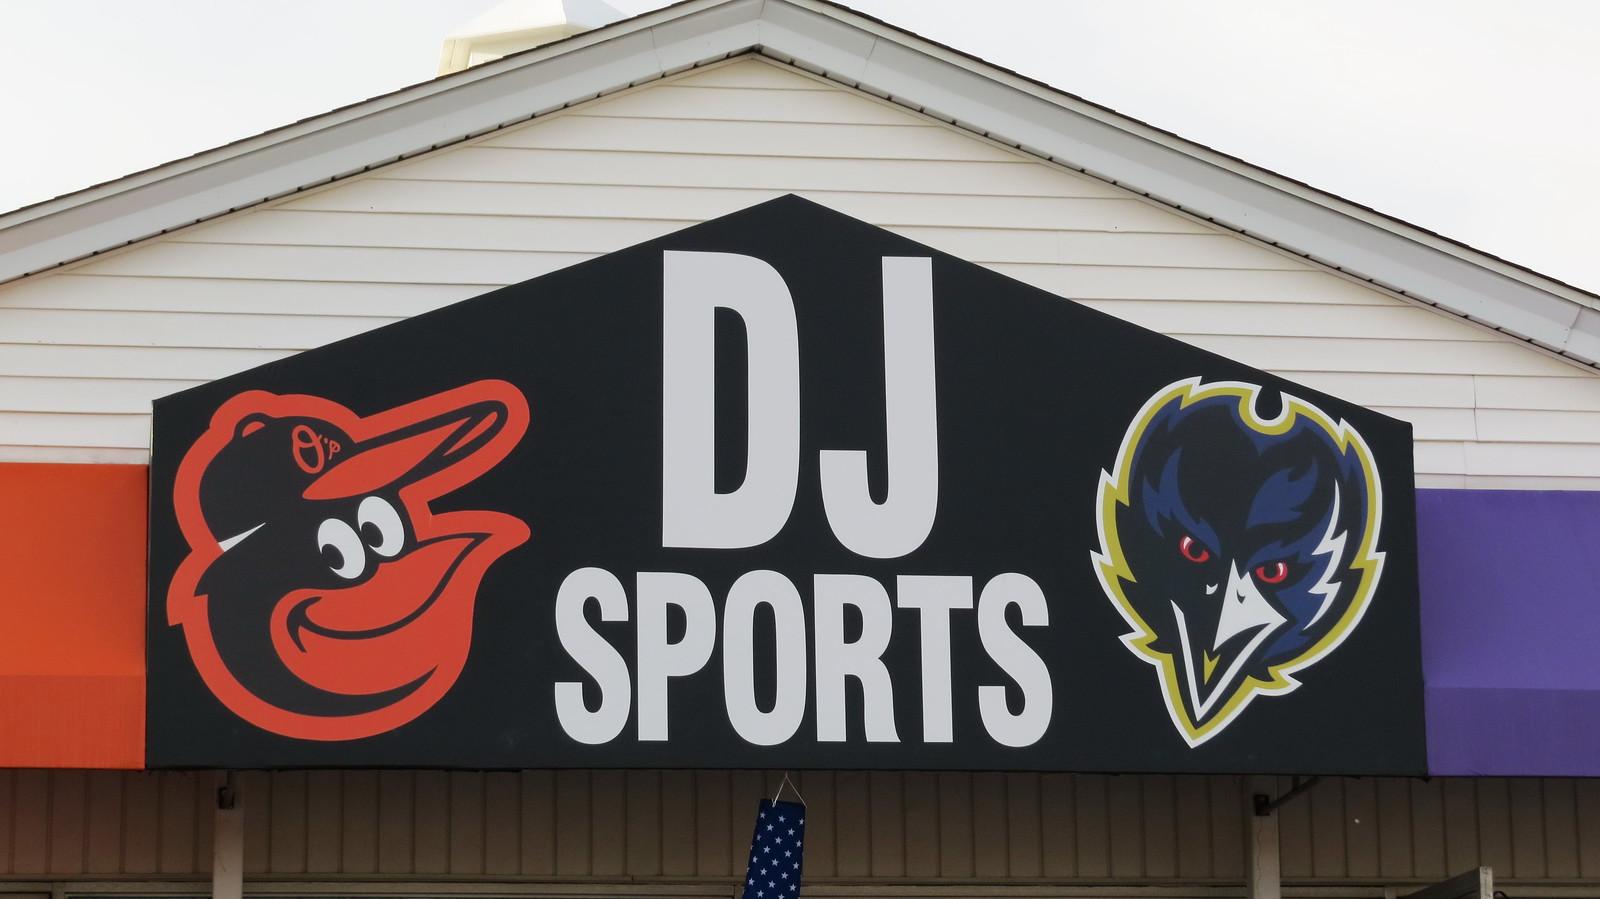 DJ Sports Bar Awning